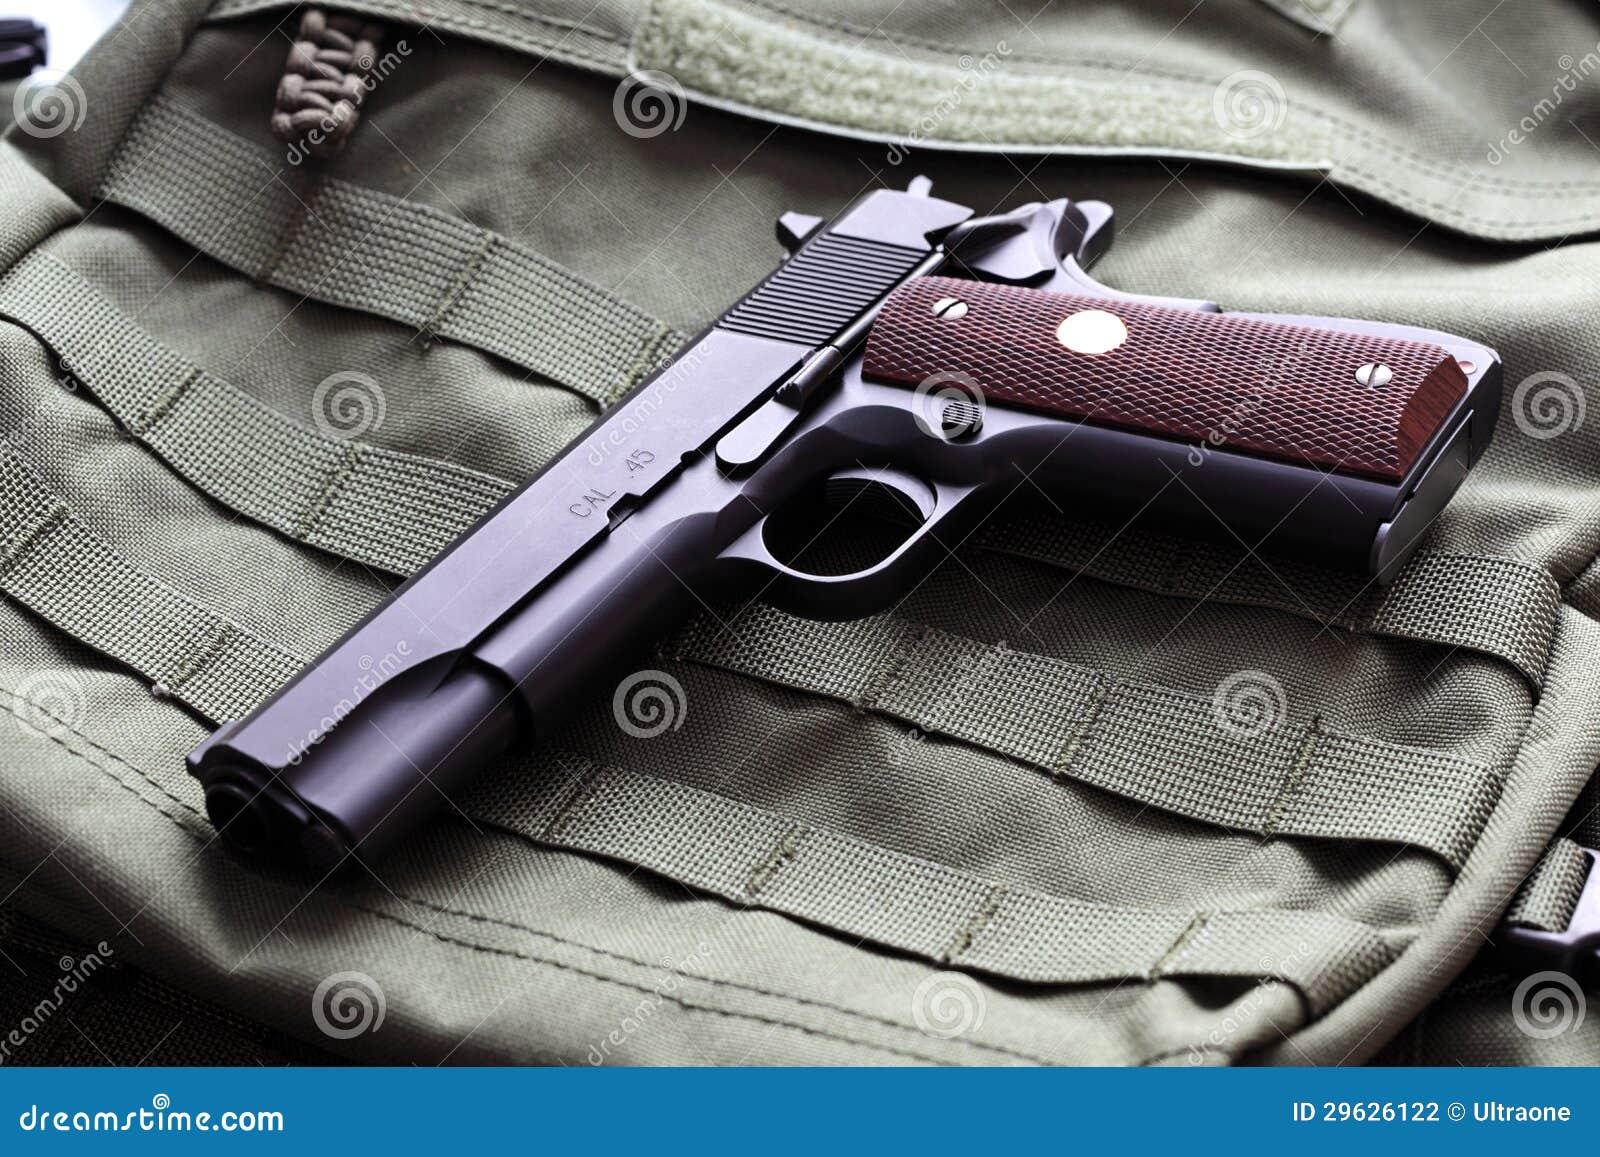 semi automatic 45 caliber pistol stock photo image of pistol semi 29626122. Black Bedroom Furniture Sets. Home Design Ideas